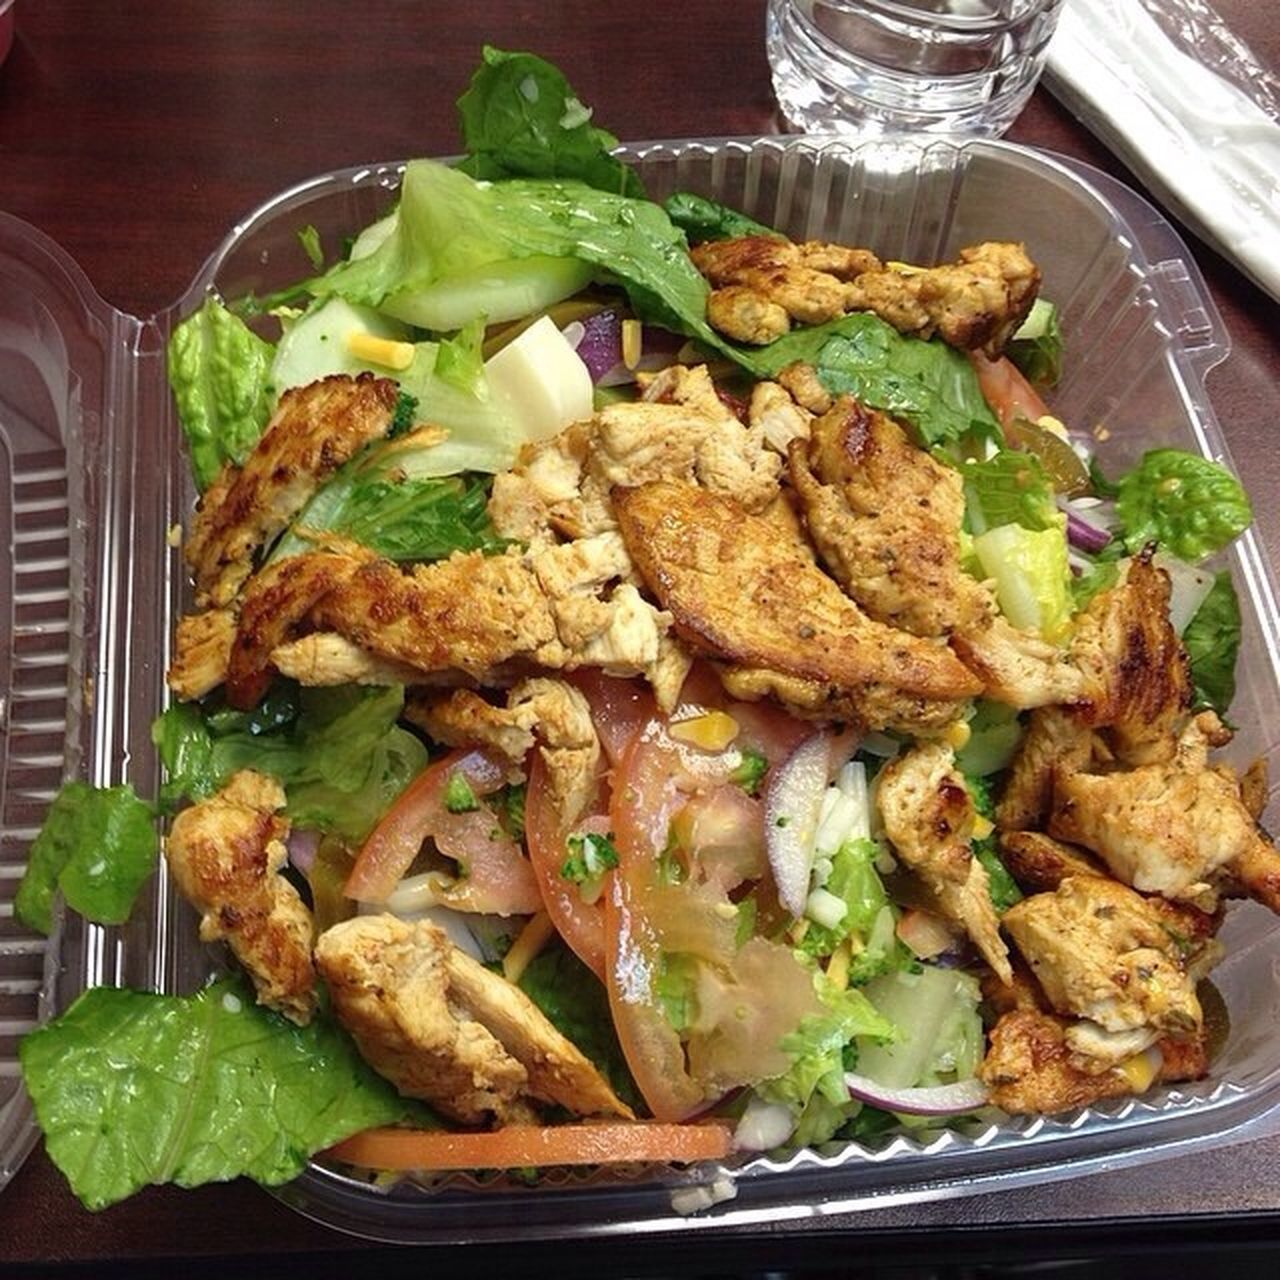 Food Porn Grilled Chicken Salad Salad Eating Healthy